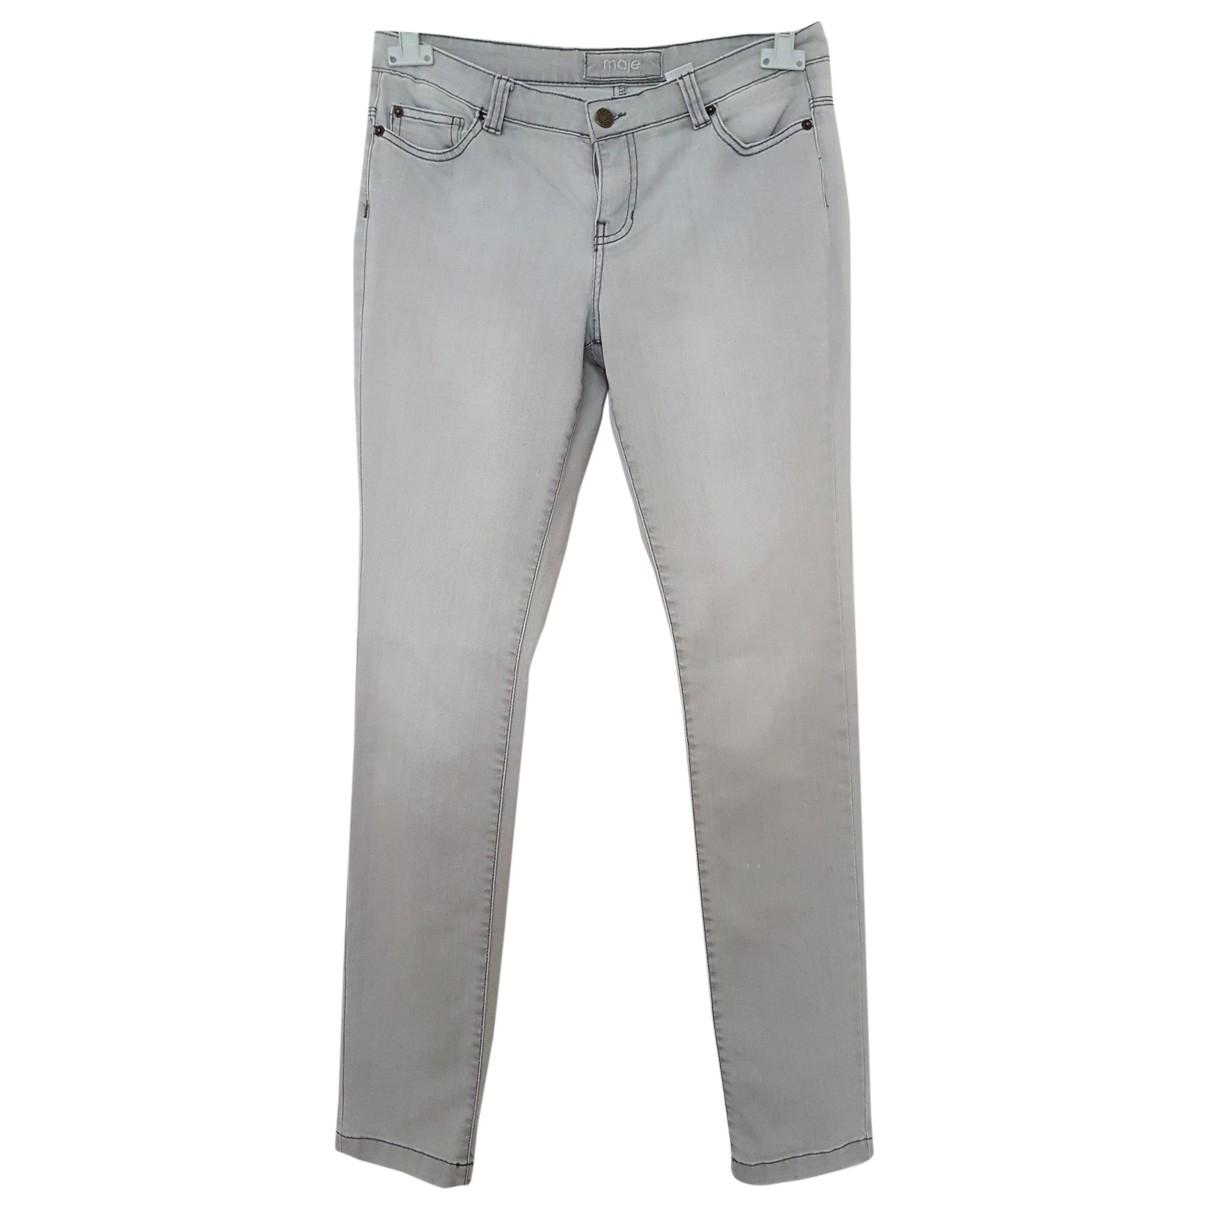 Maje \N Grey Cotton - elasthane Jeans for Women 38 FR